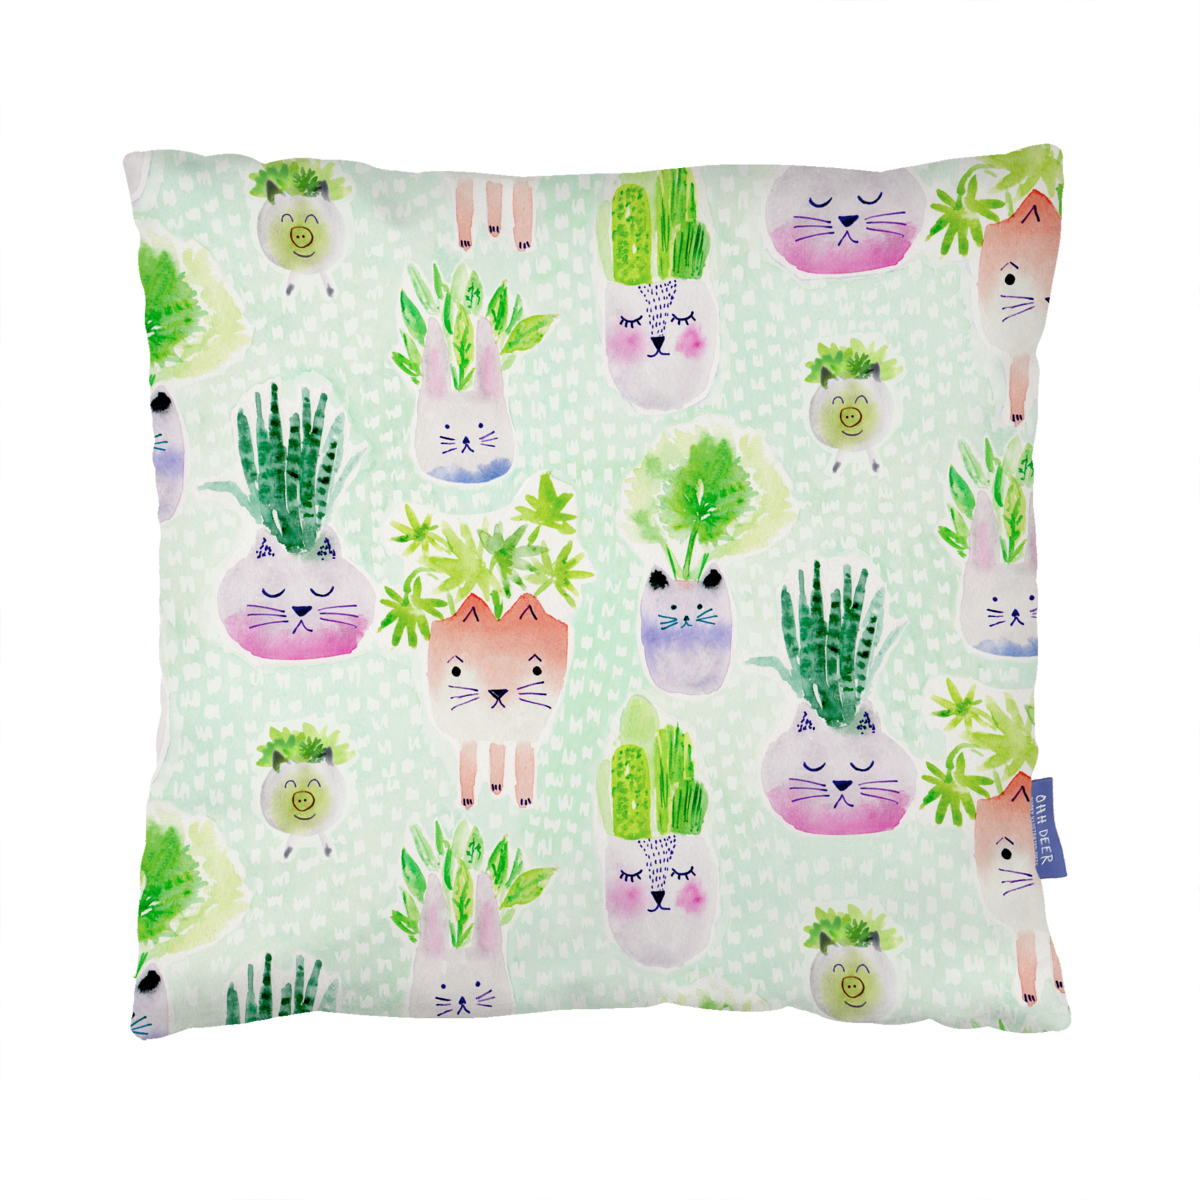 Planter Pals cushion